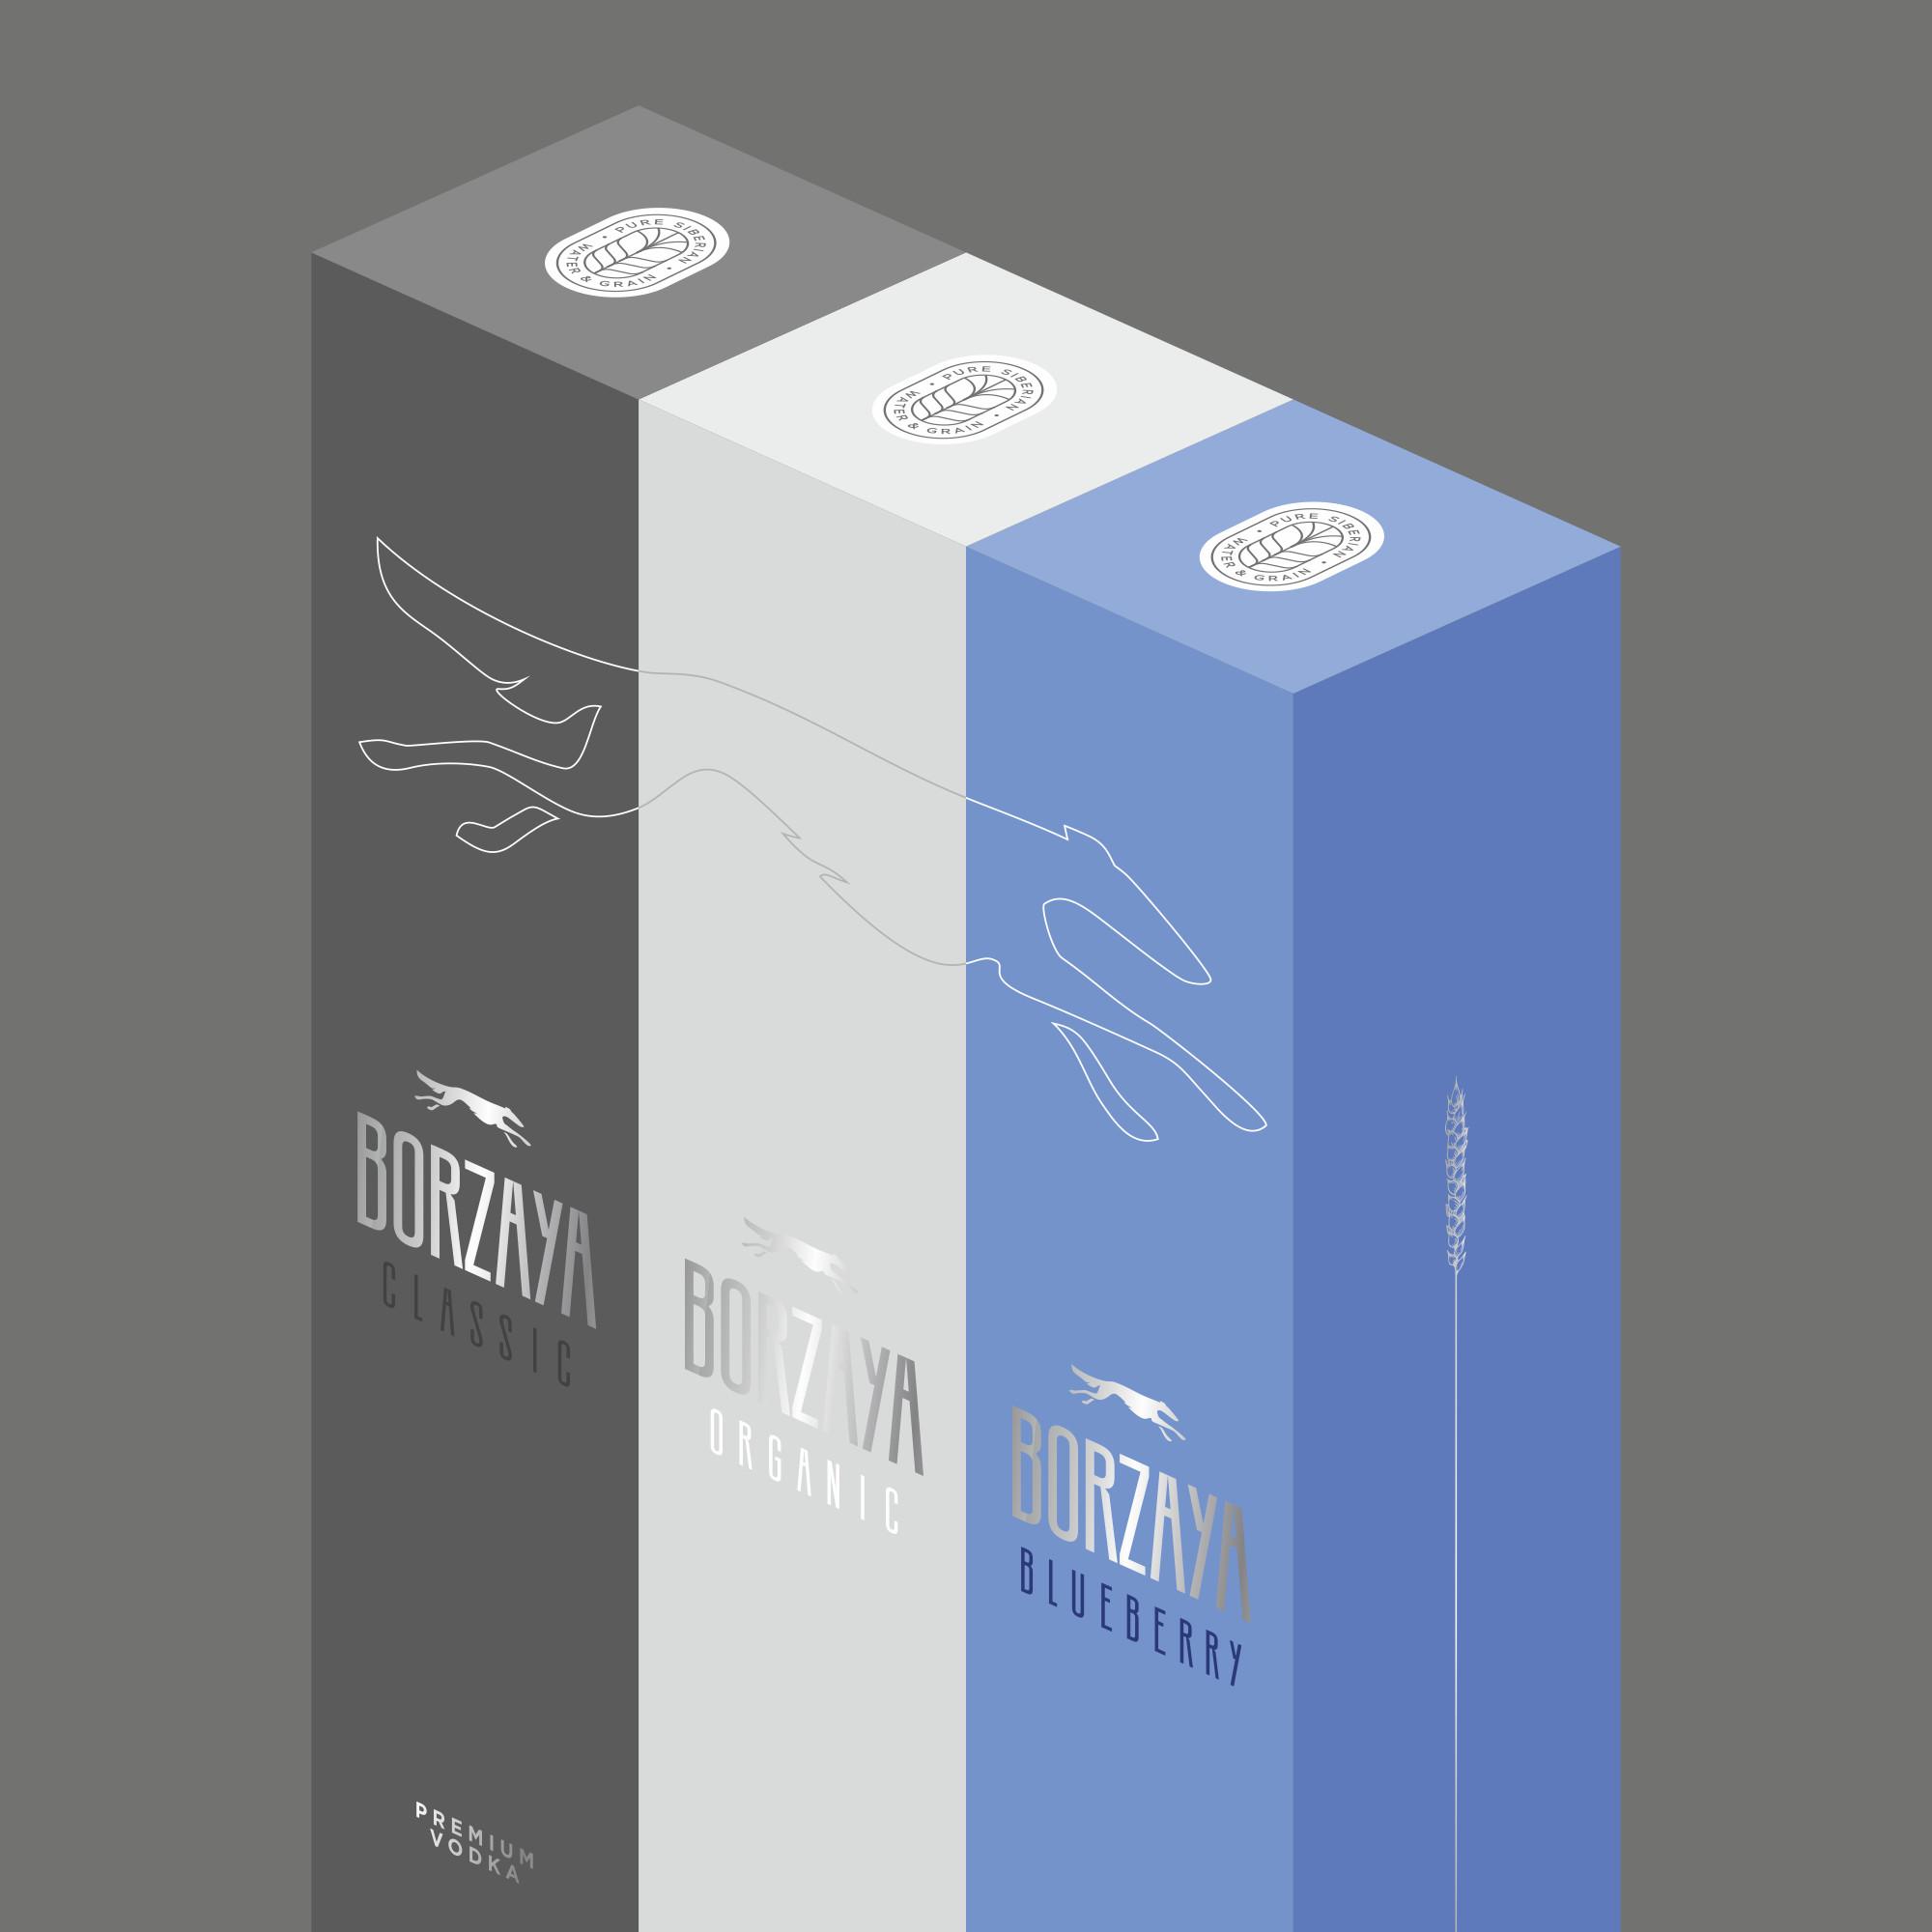 Premium Borzaya Vodka Packaging Design